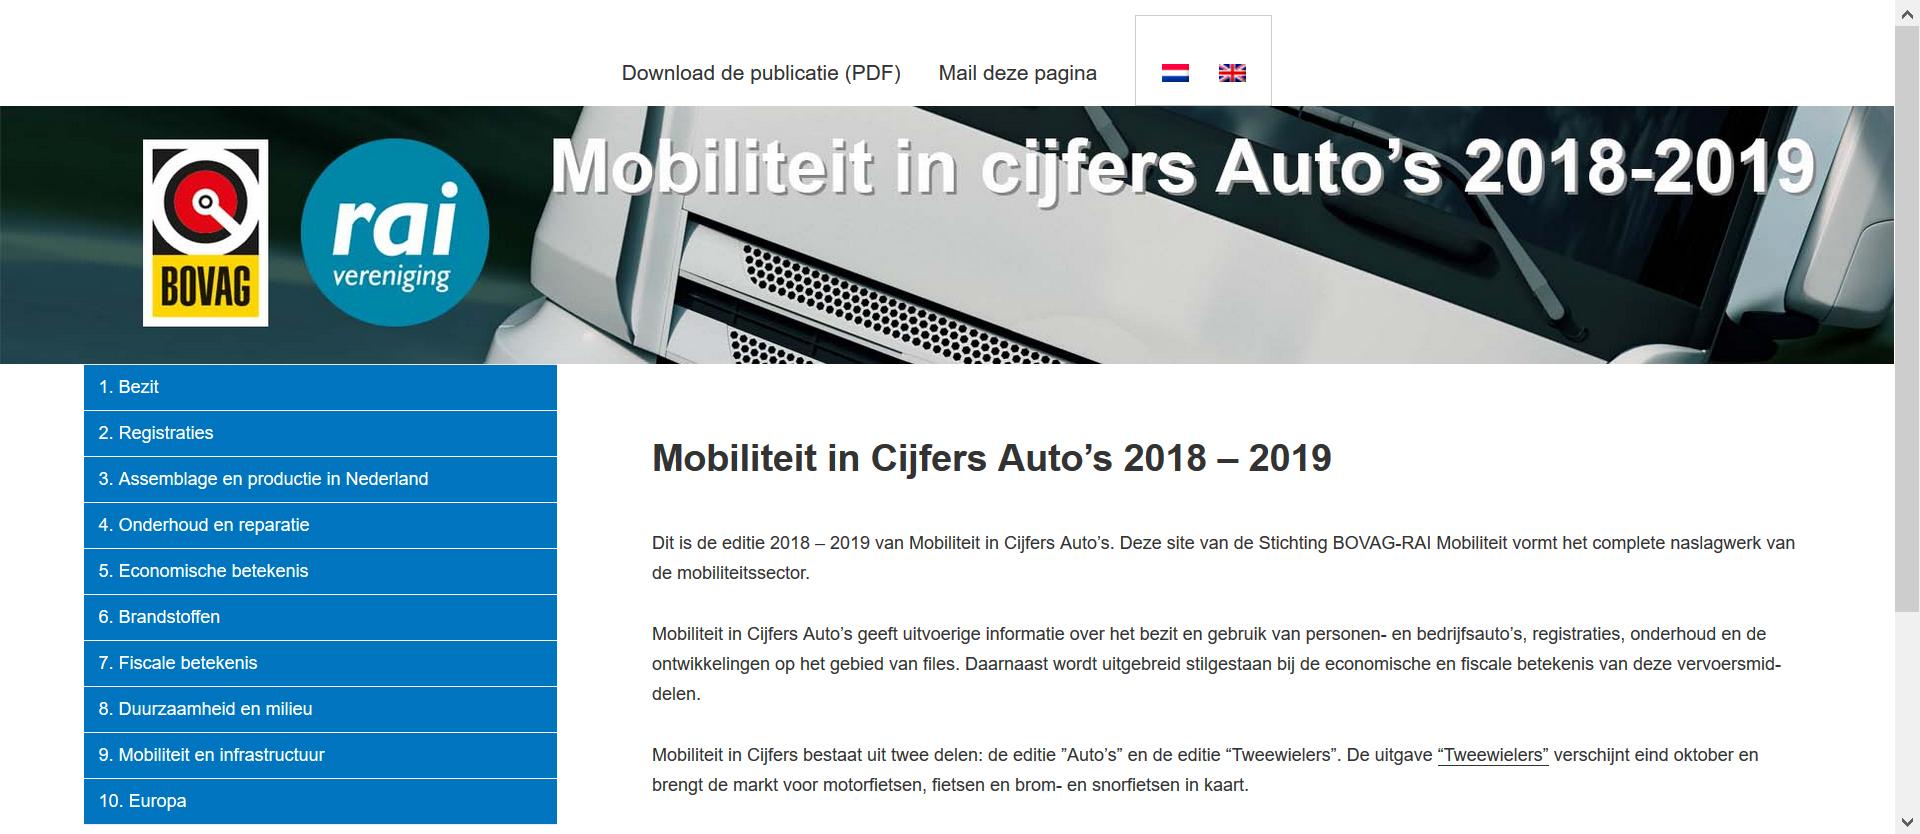 Mobiliteit in Cijfers Auto 2018